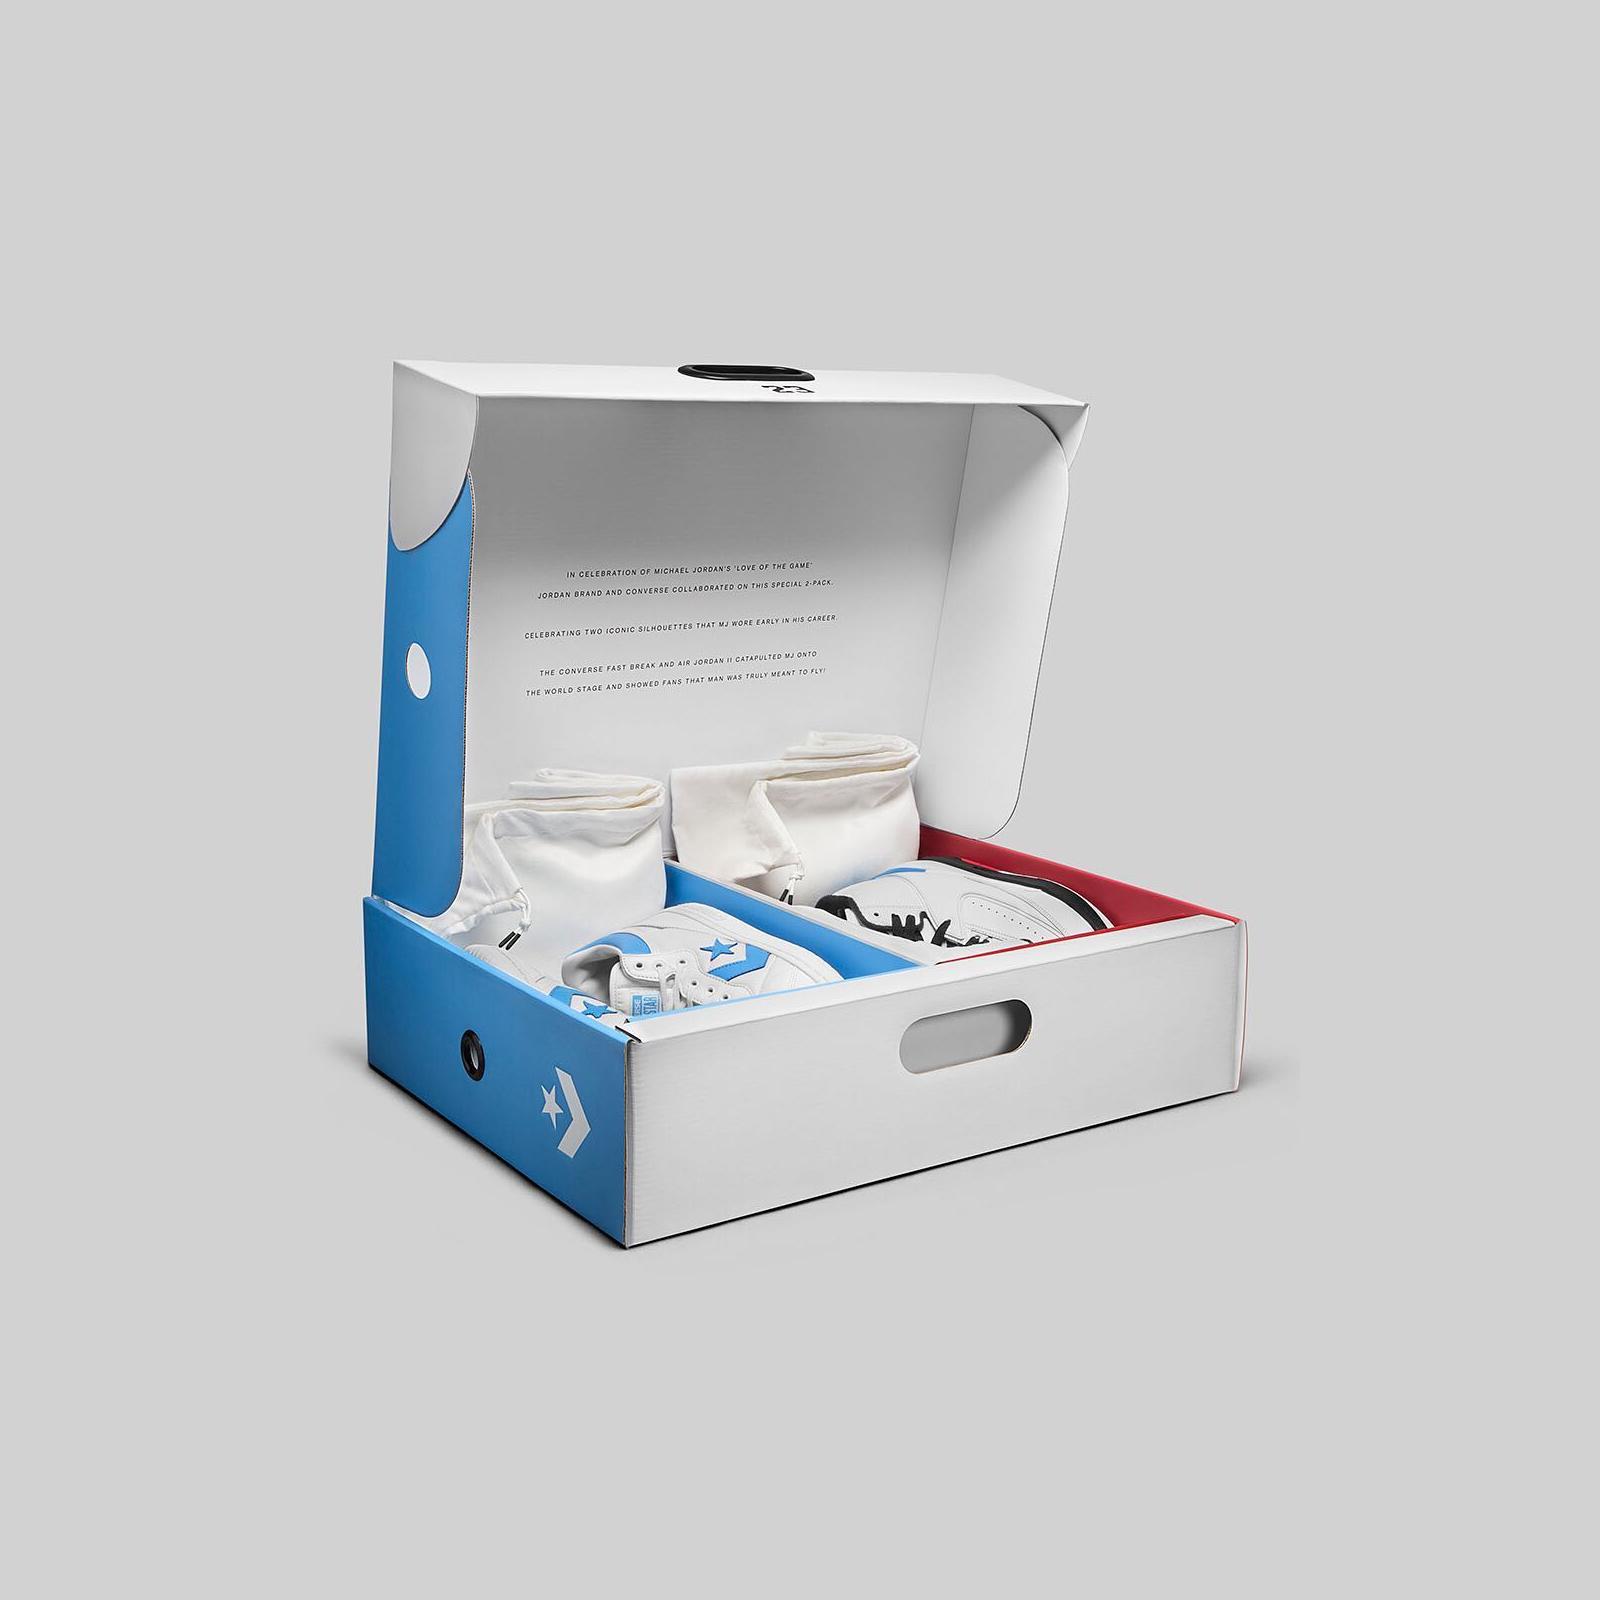 8661bd6a2b5319 Jordan Brand Jordan X Converse Pack - 917931-900 - Sneakersnstuff ...